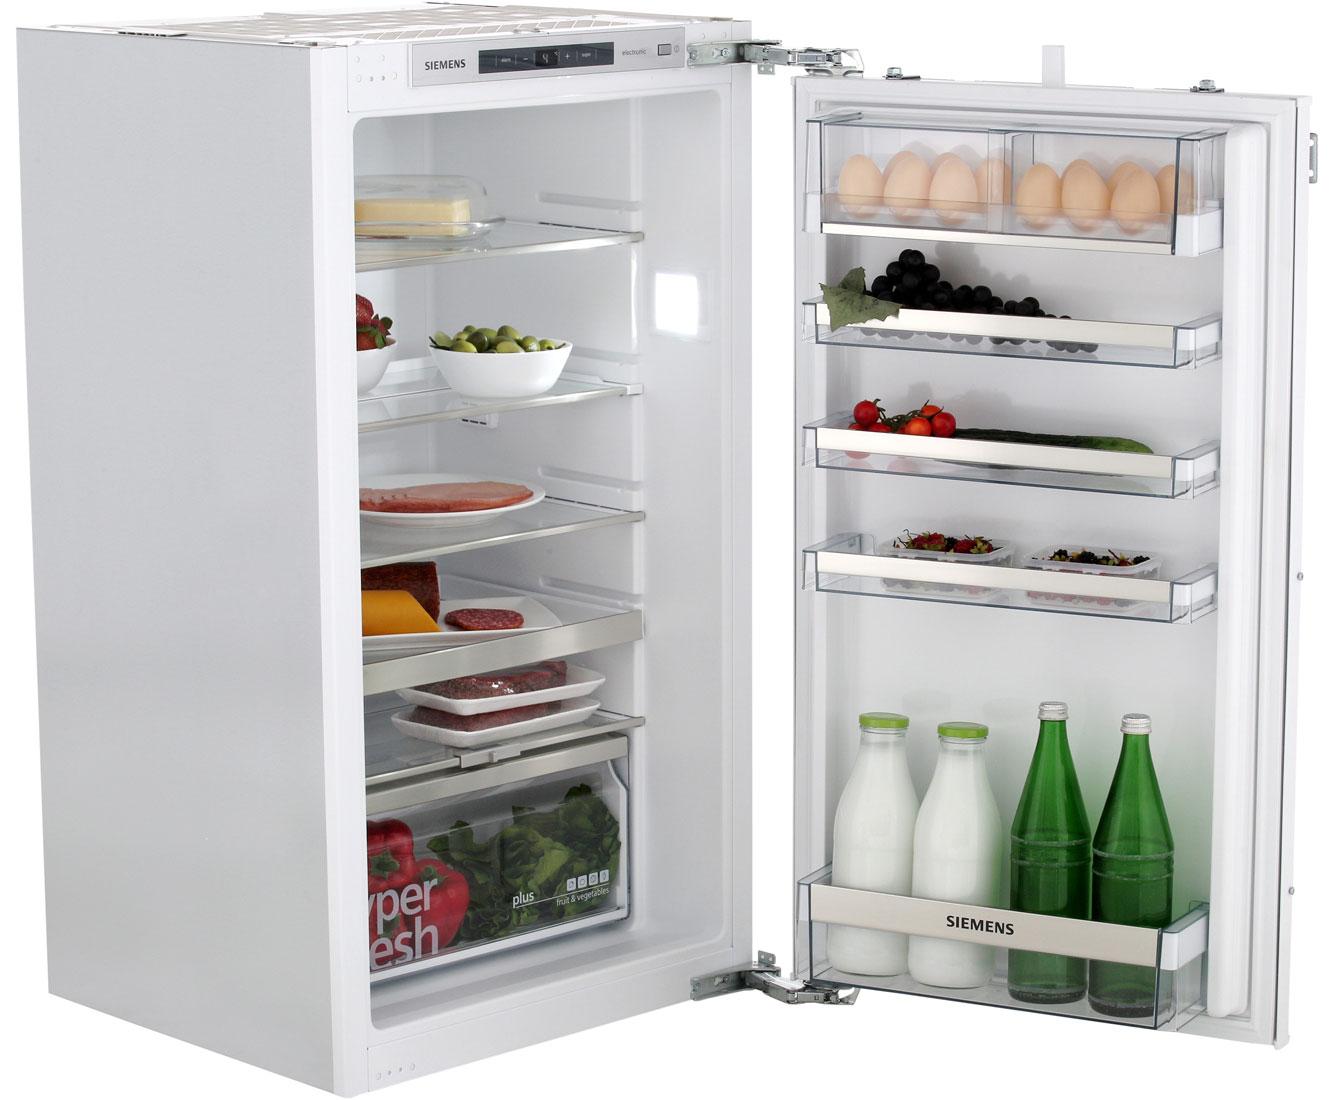 Siemens Kühlschrank A : Siemens iq ki raf einbau kühlschrank er nische festtür